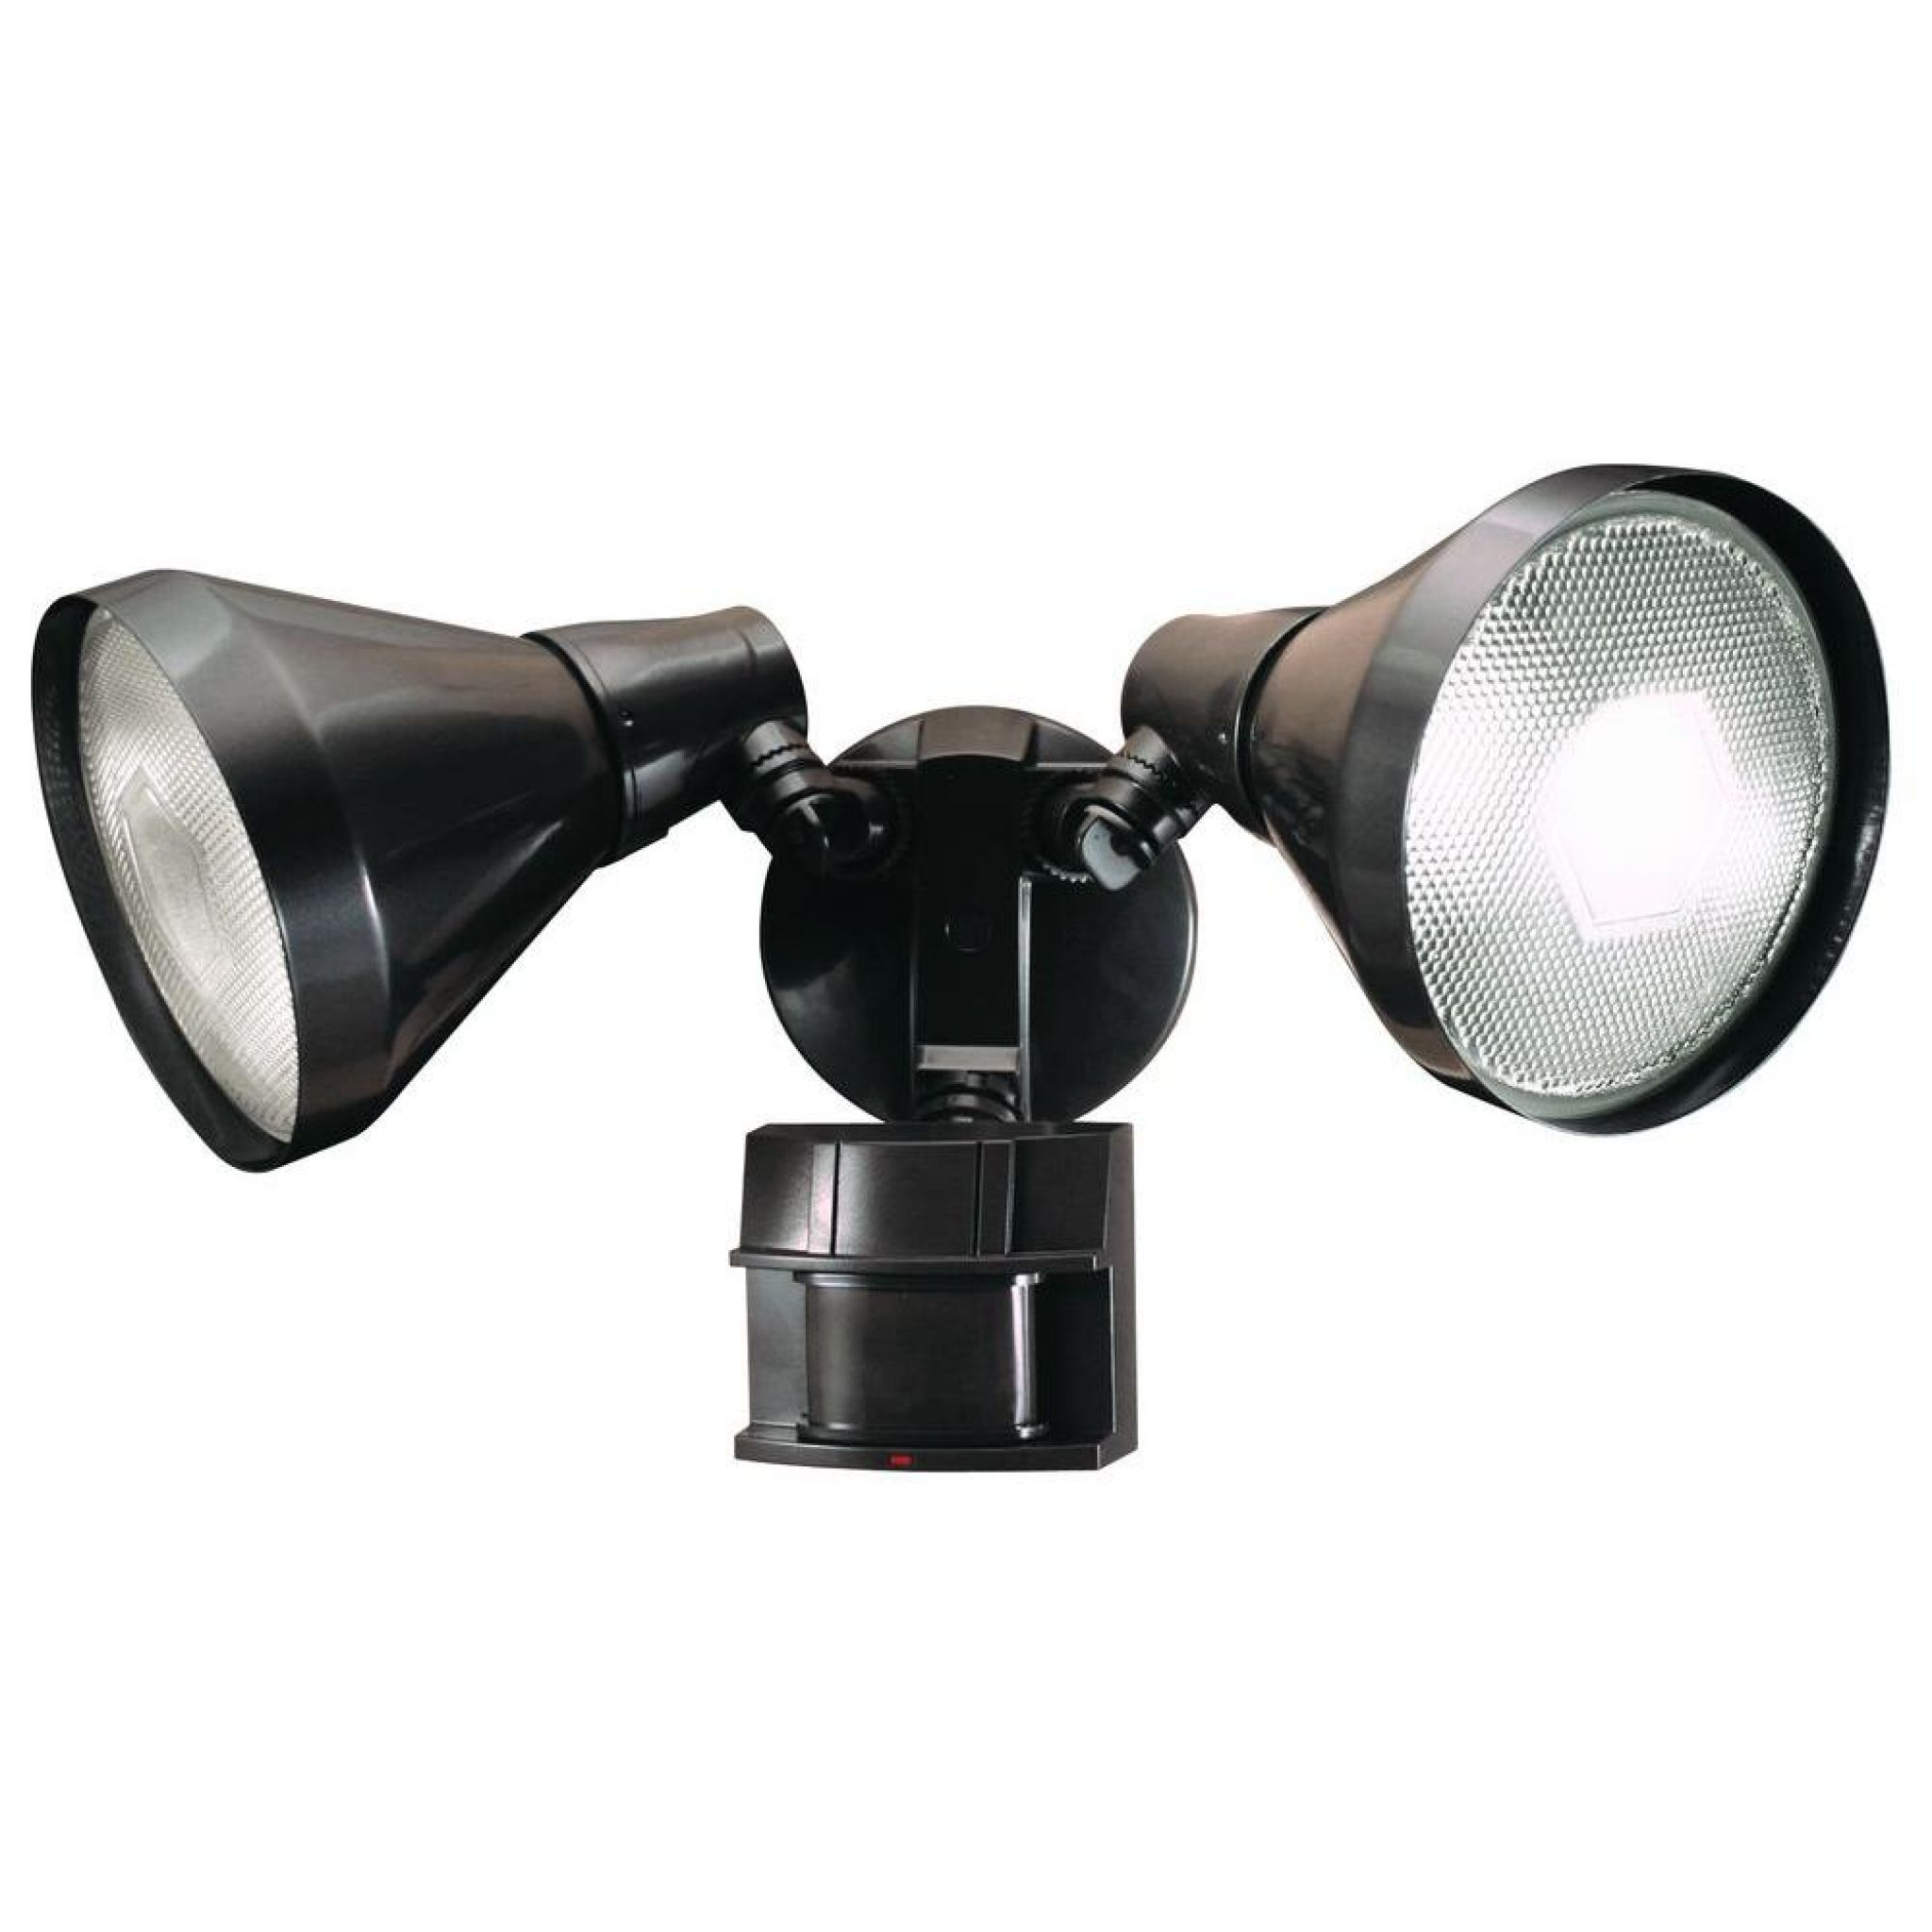 wholesale lights floodlight with lighting security light sensor outdoor lumen white daylight flood lte home waterproof led motion decoration pir pid